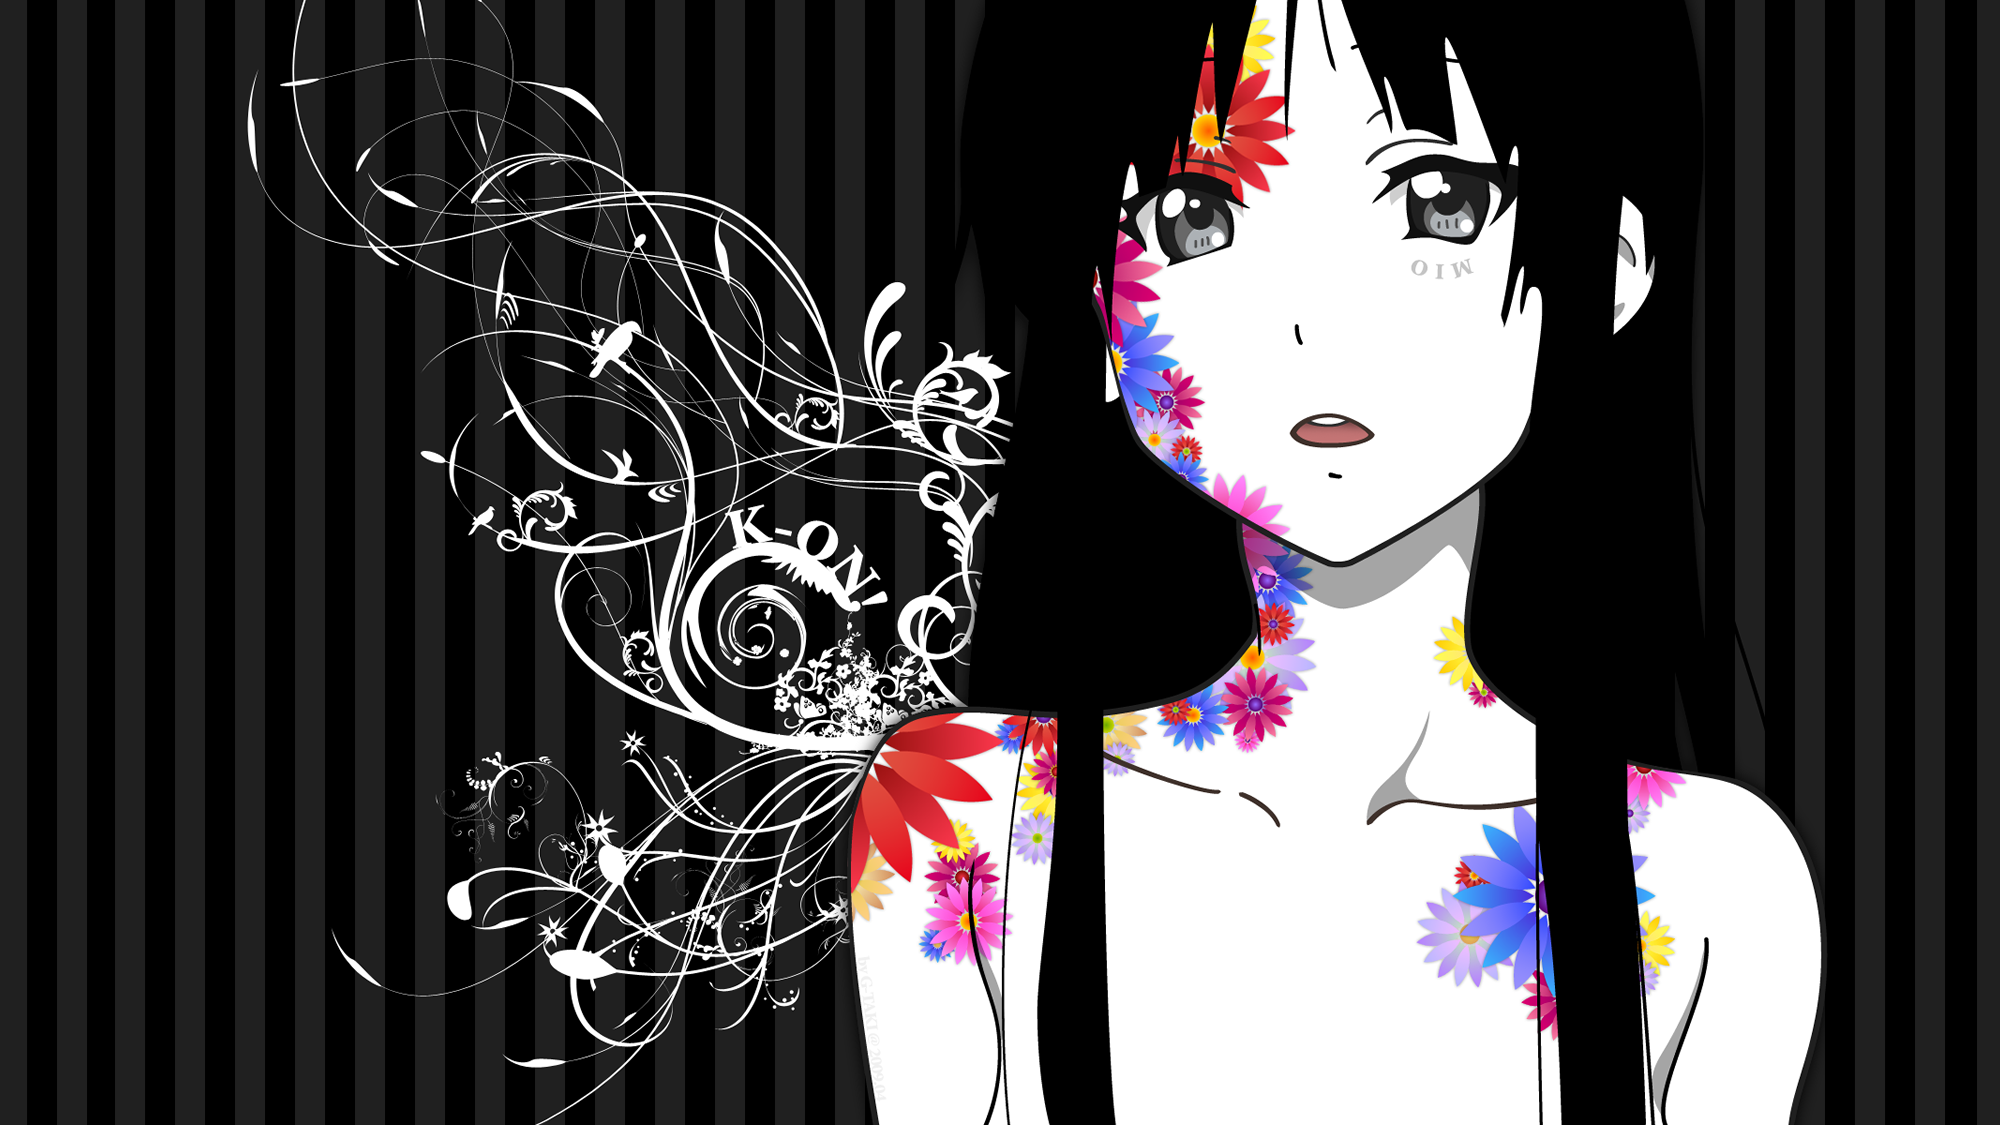 Картинки, картинки аниме с надписями о музыке